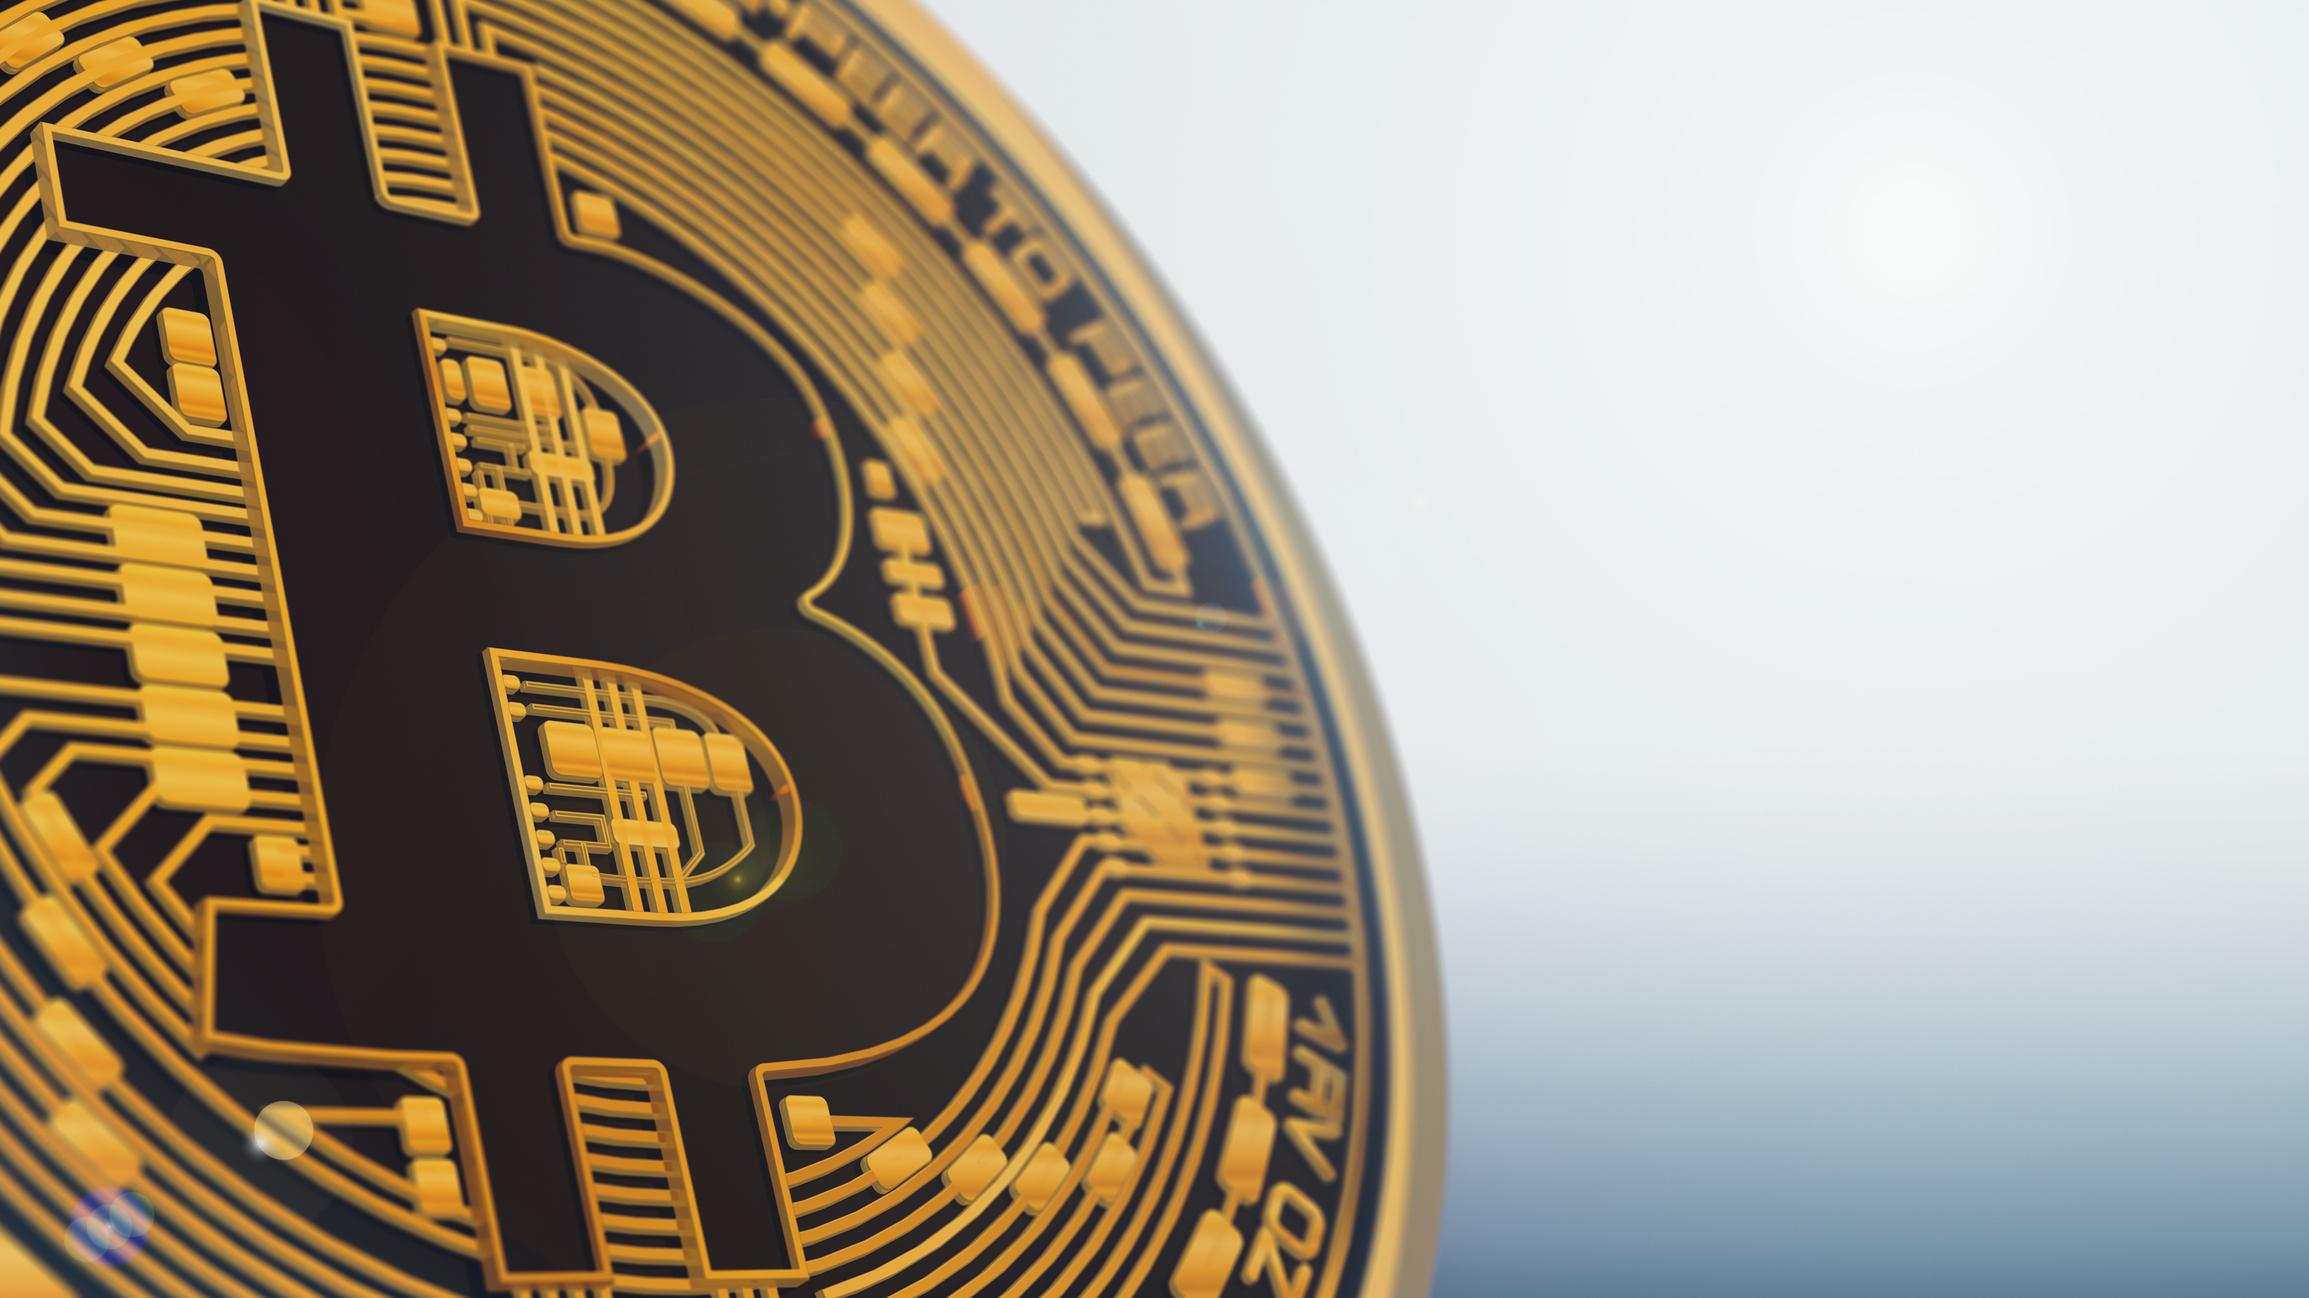 An up-close look at a physical gold bitcoin.